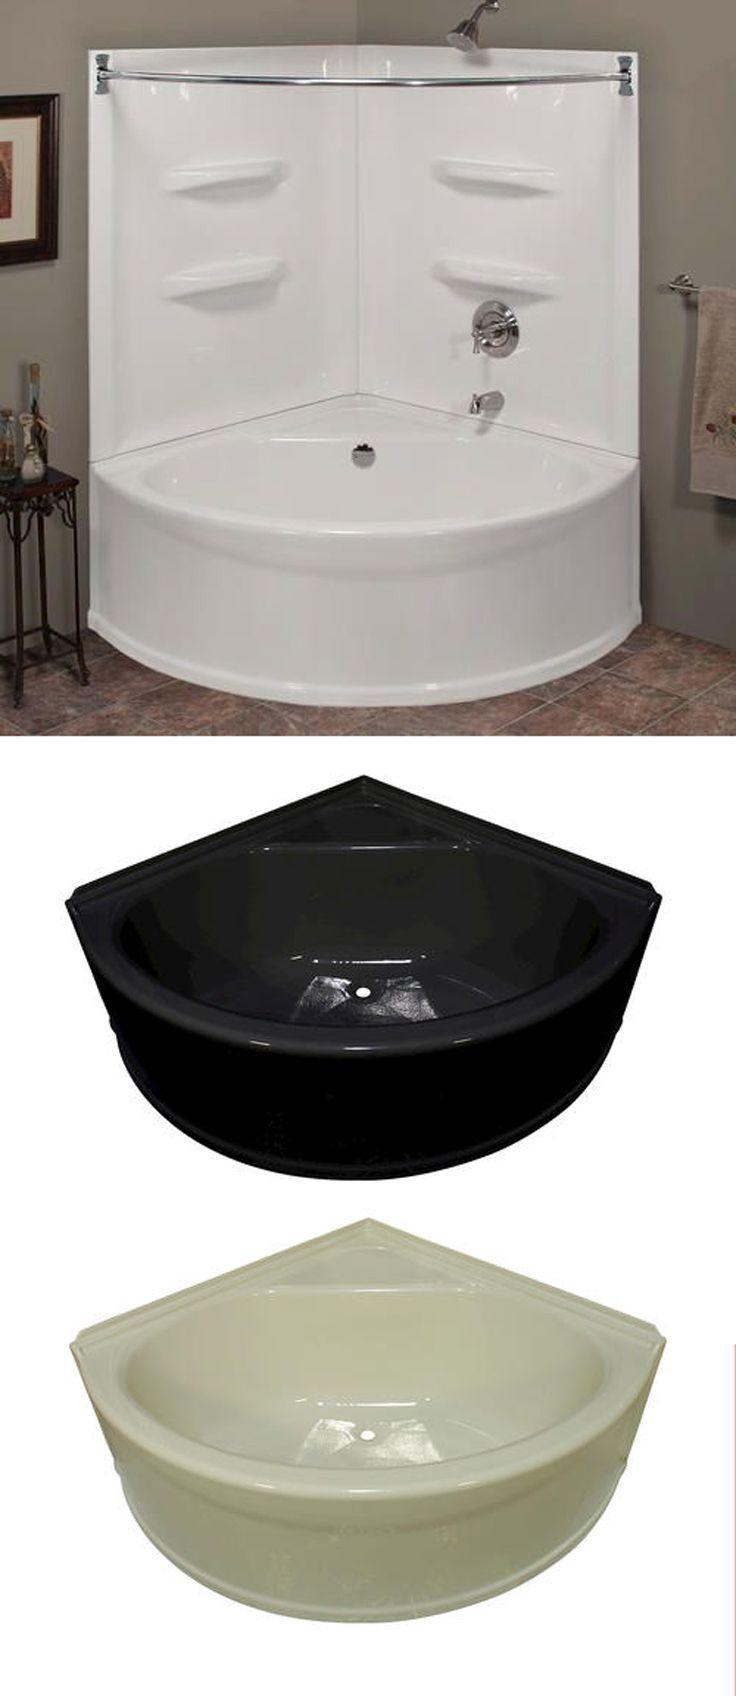 Lyons Sea Wave V Corner Soaking Bathtub. Heated. Comes in White ...